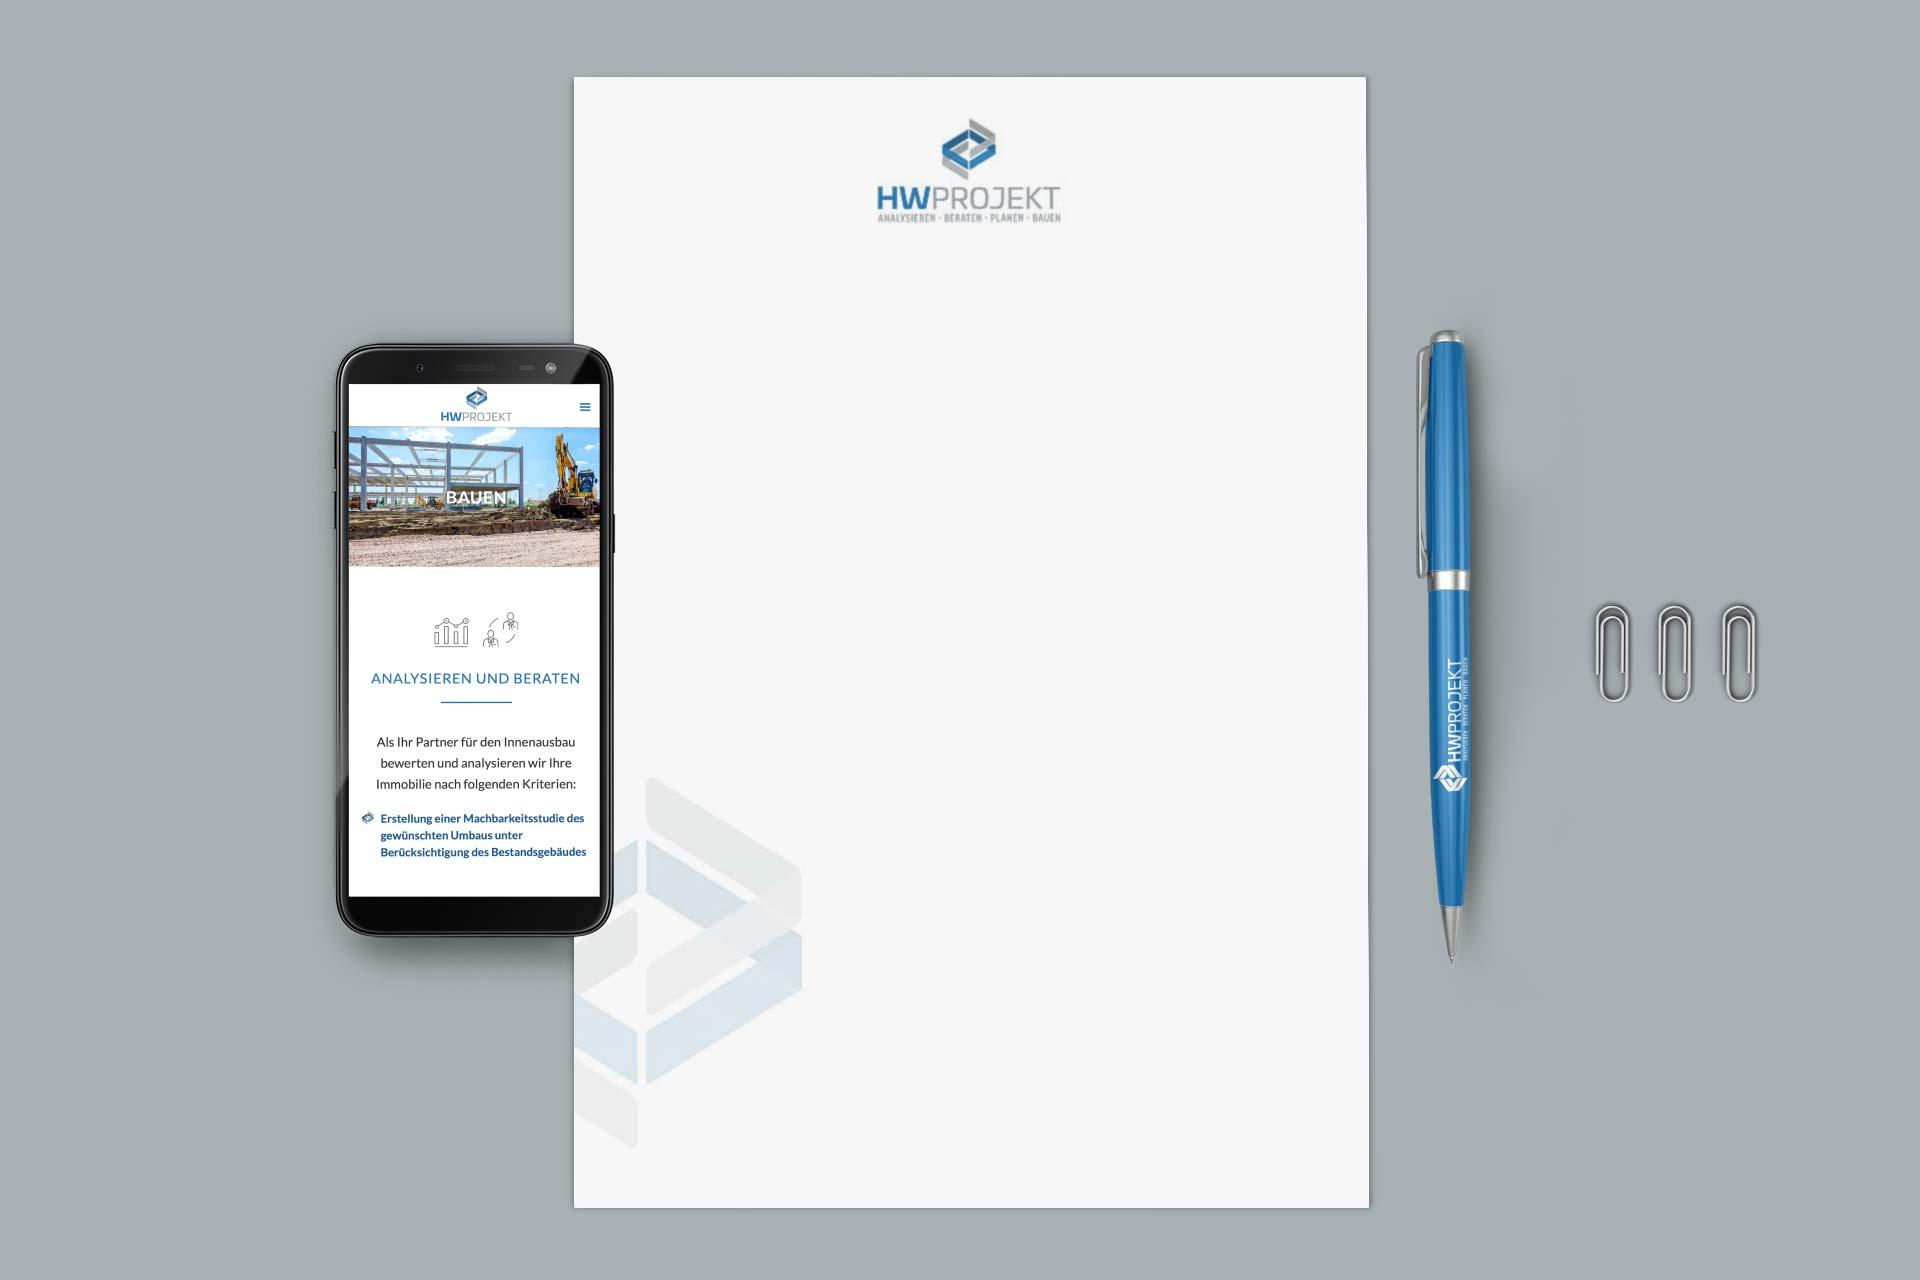 HW Projekt GmbH